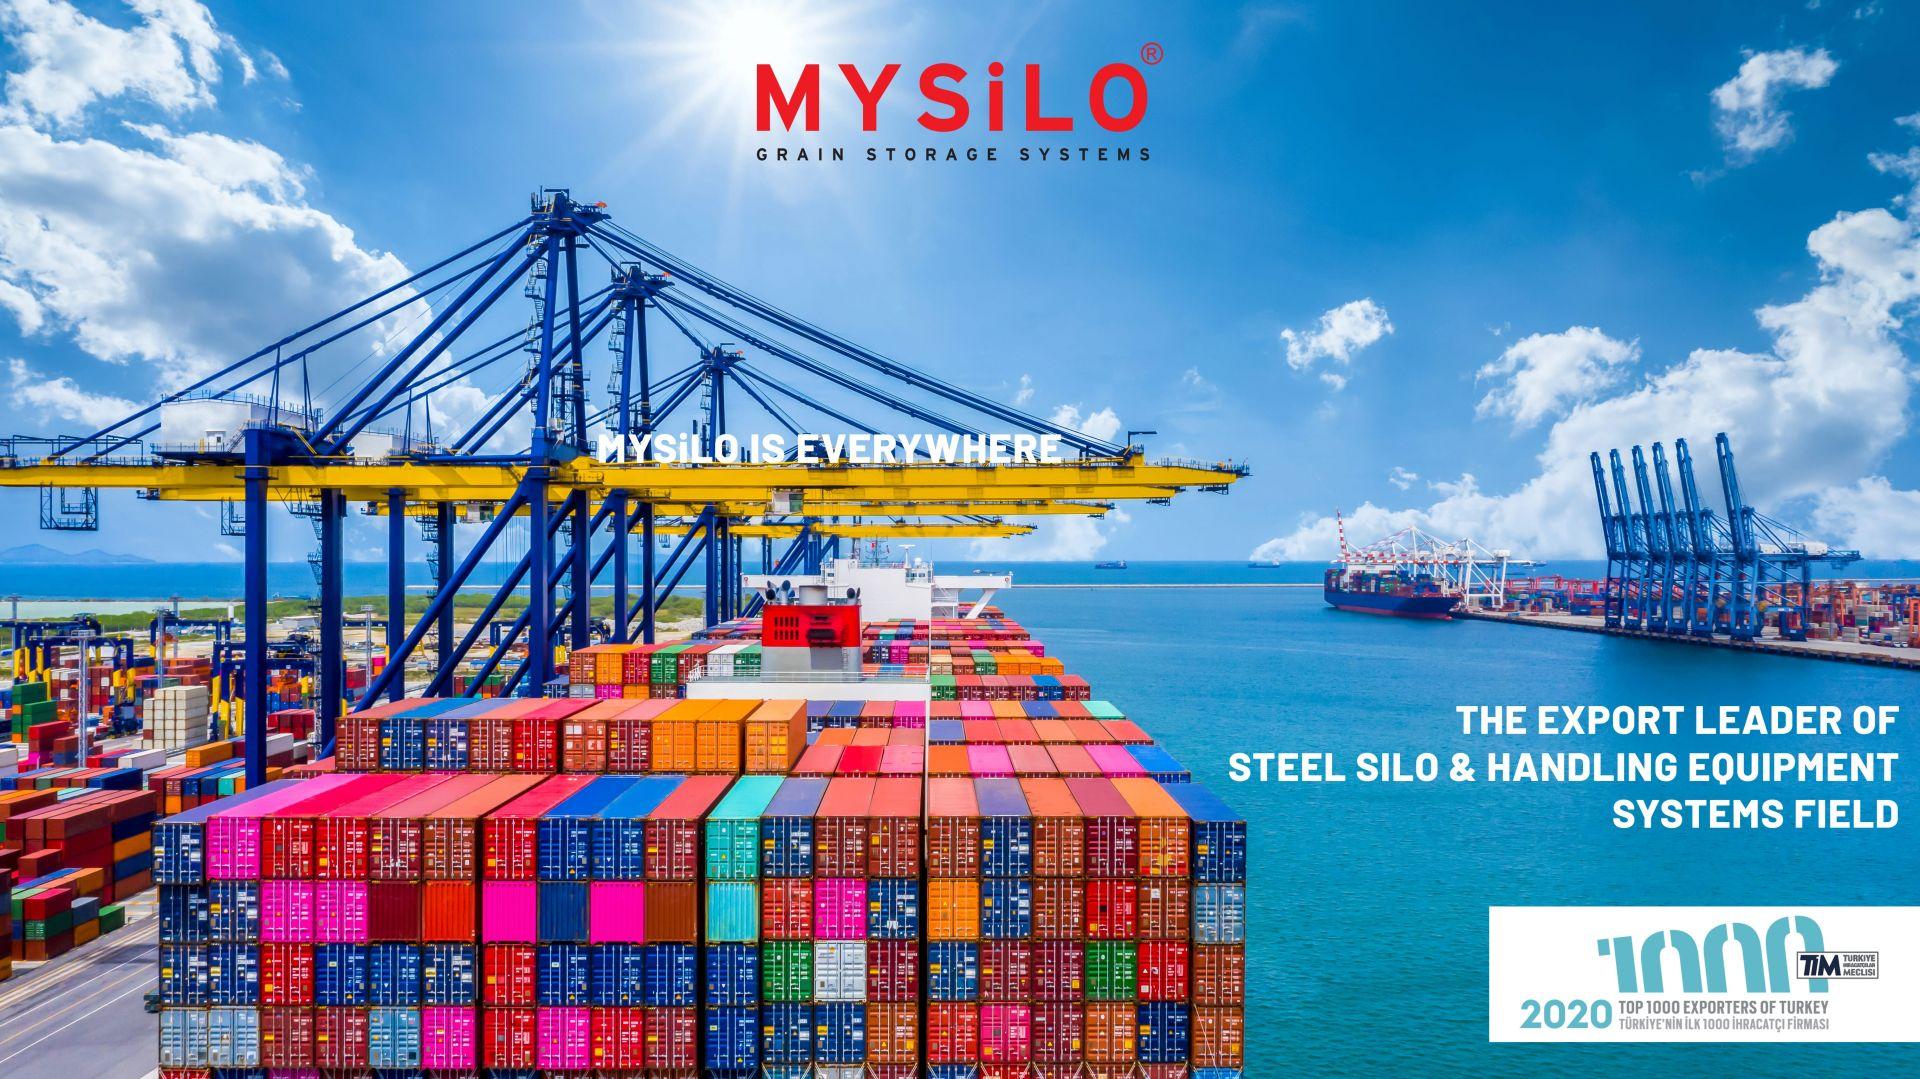 2021 Mysilo Top 1000 Exporters